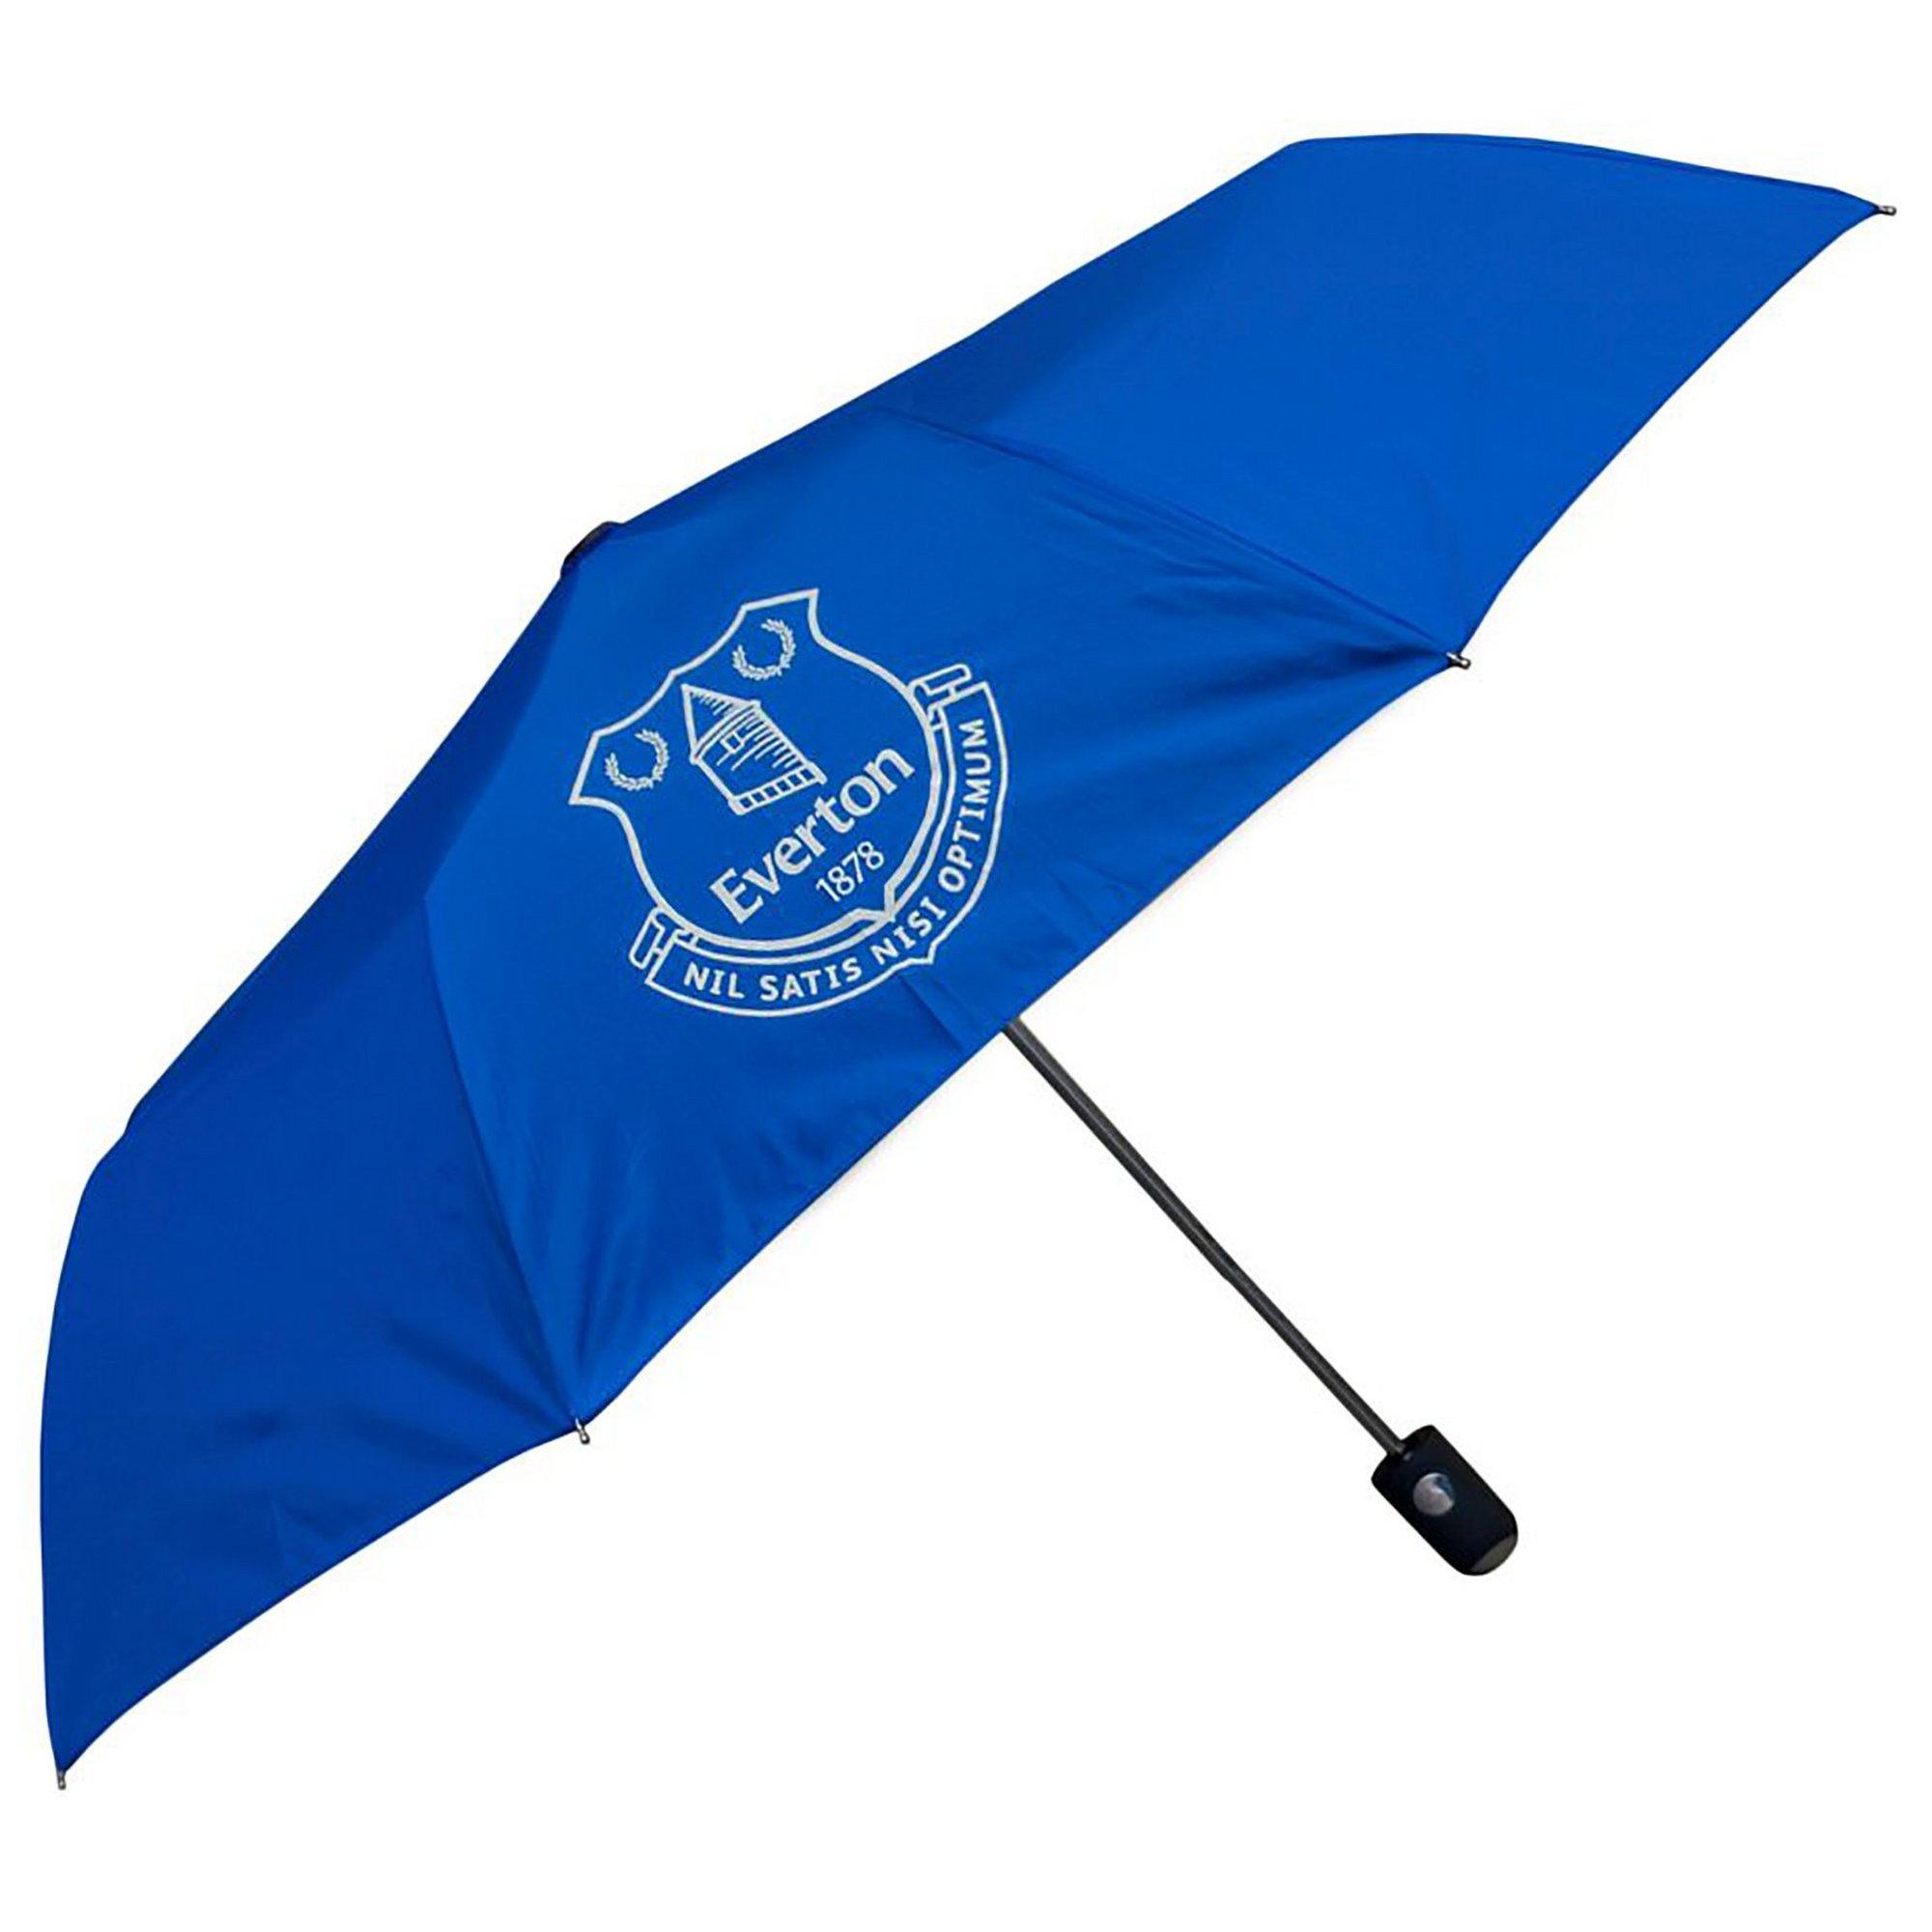 Image of Everton FC Mini Automatic Umbrella